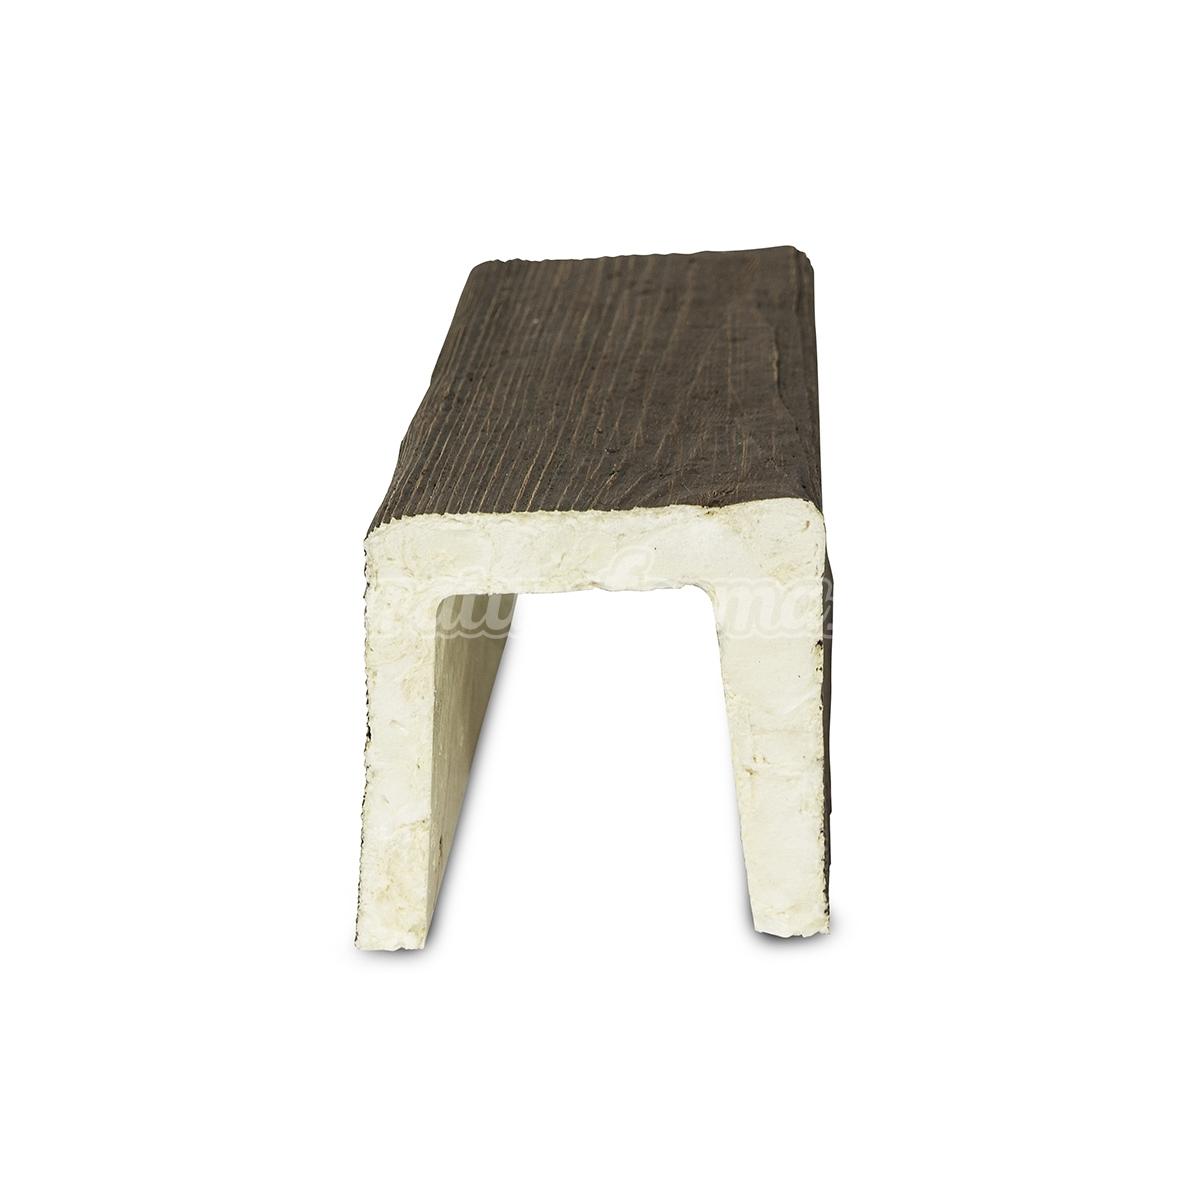 Grupo Unamacor Viga 200x10x10 imitación madera